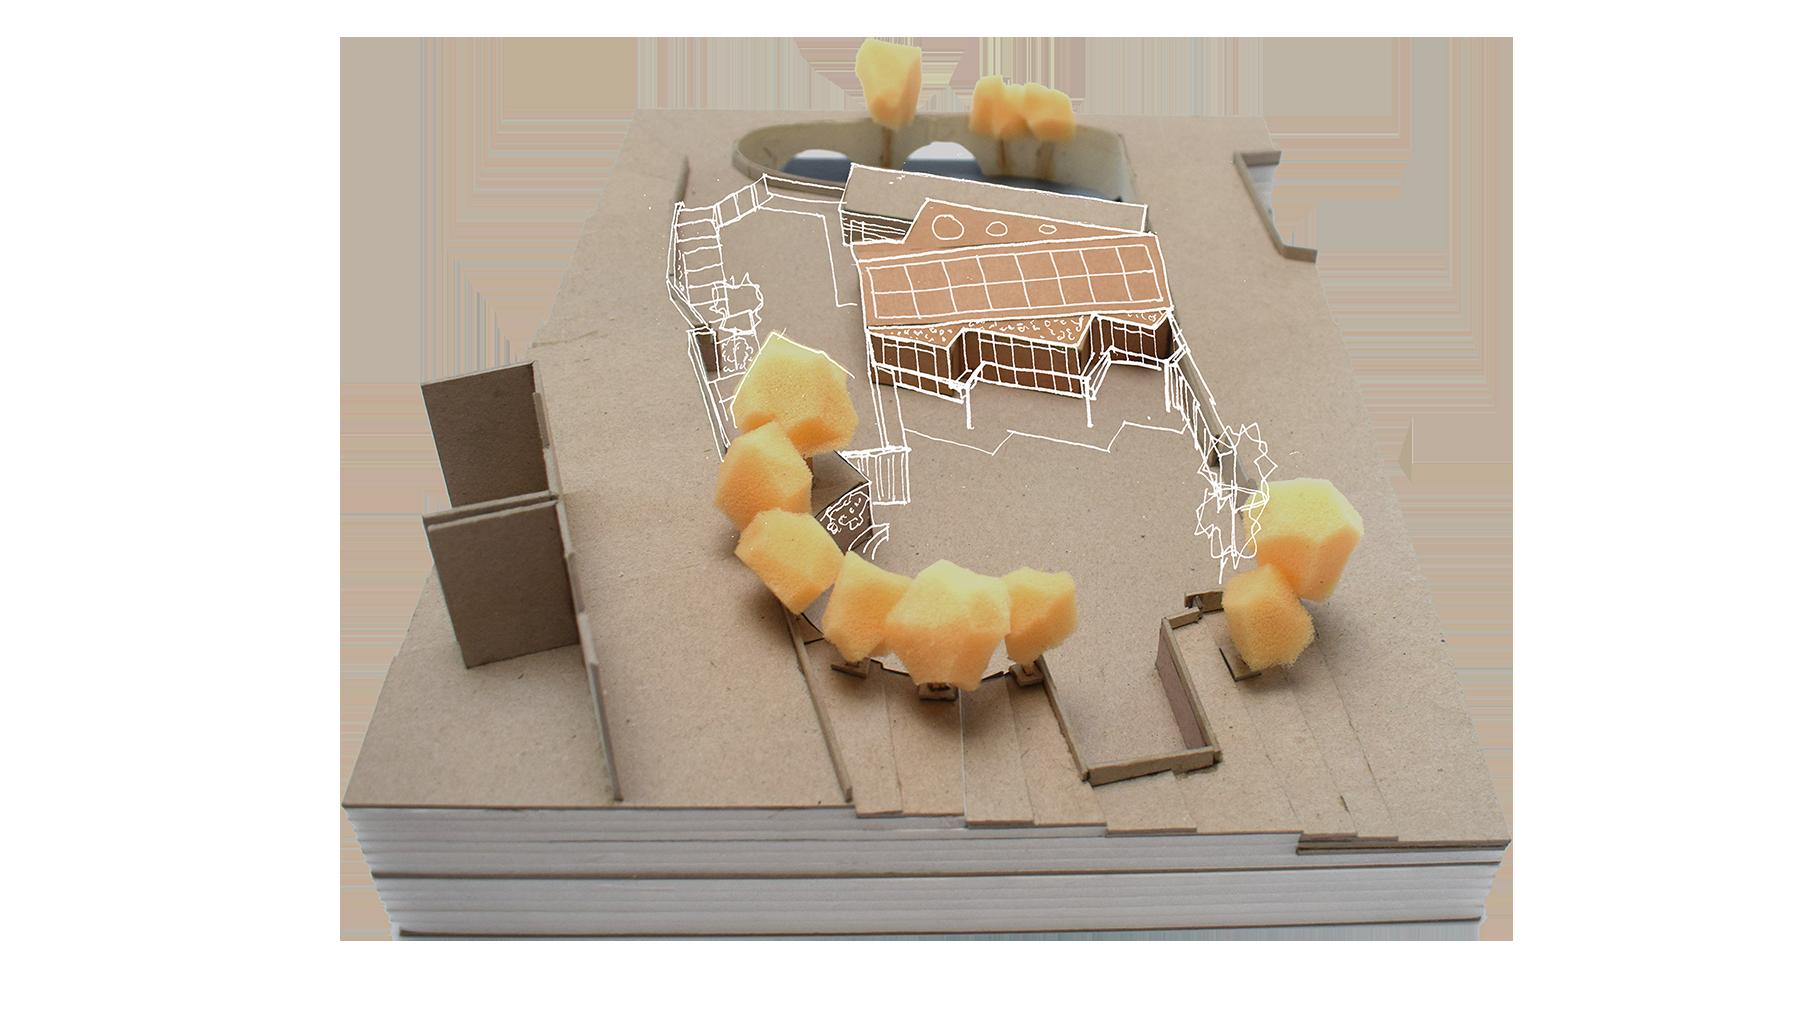 Sarah-Wigglesworth-Architects Portland-Nursery Model-3 1800-slide